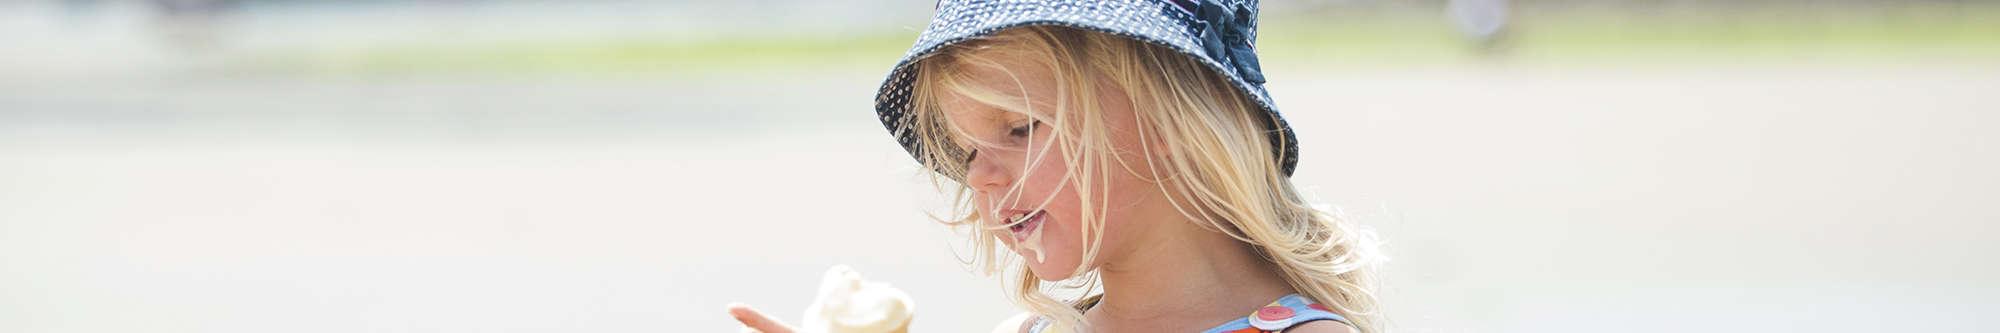 little girl enjoying an ice cream